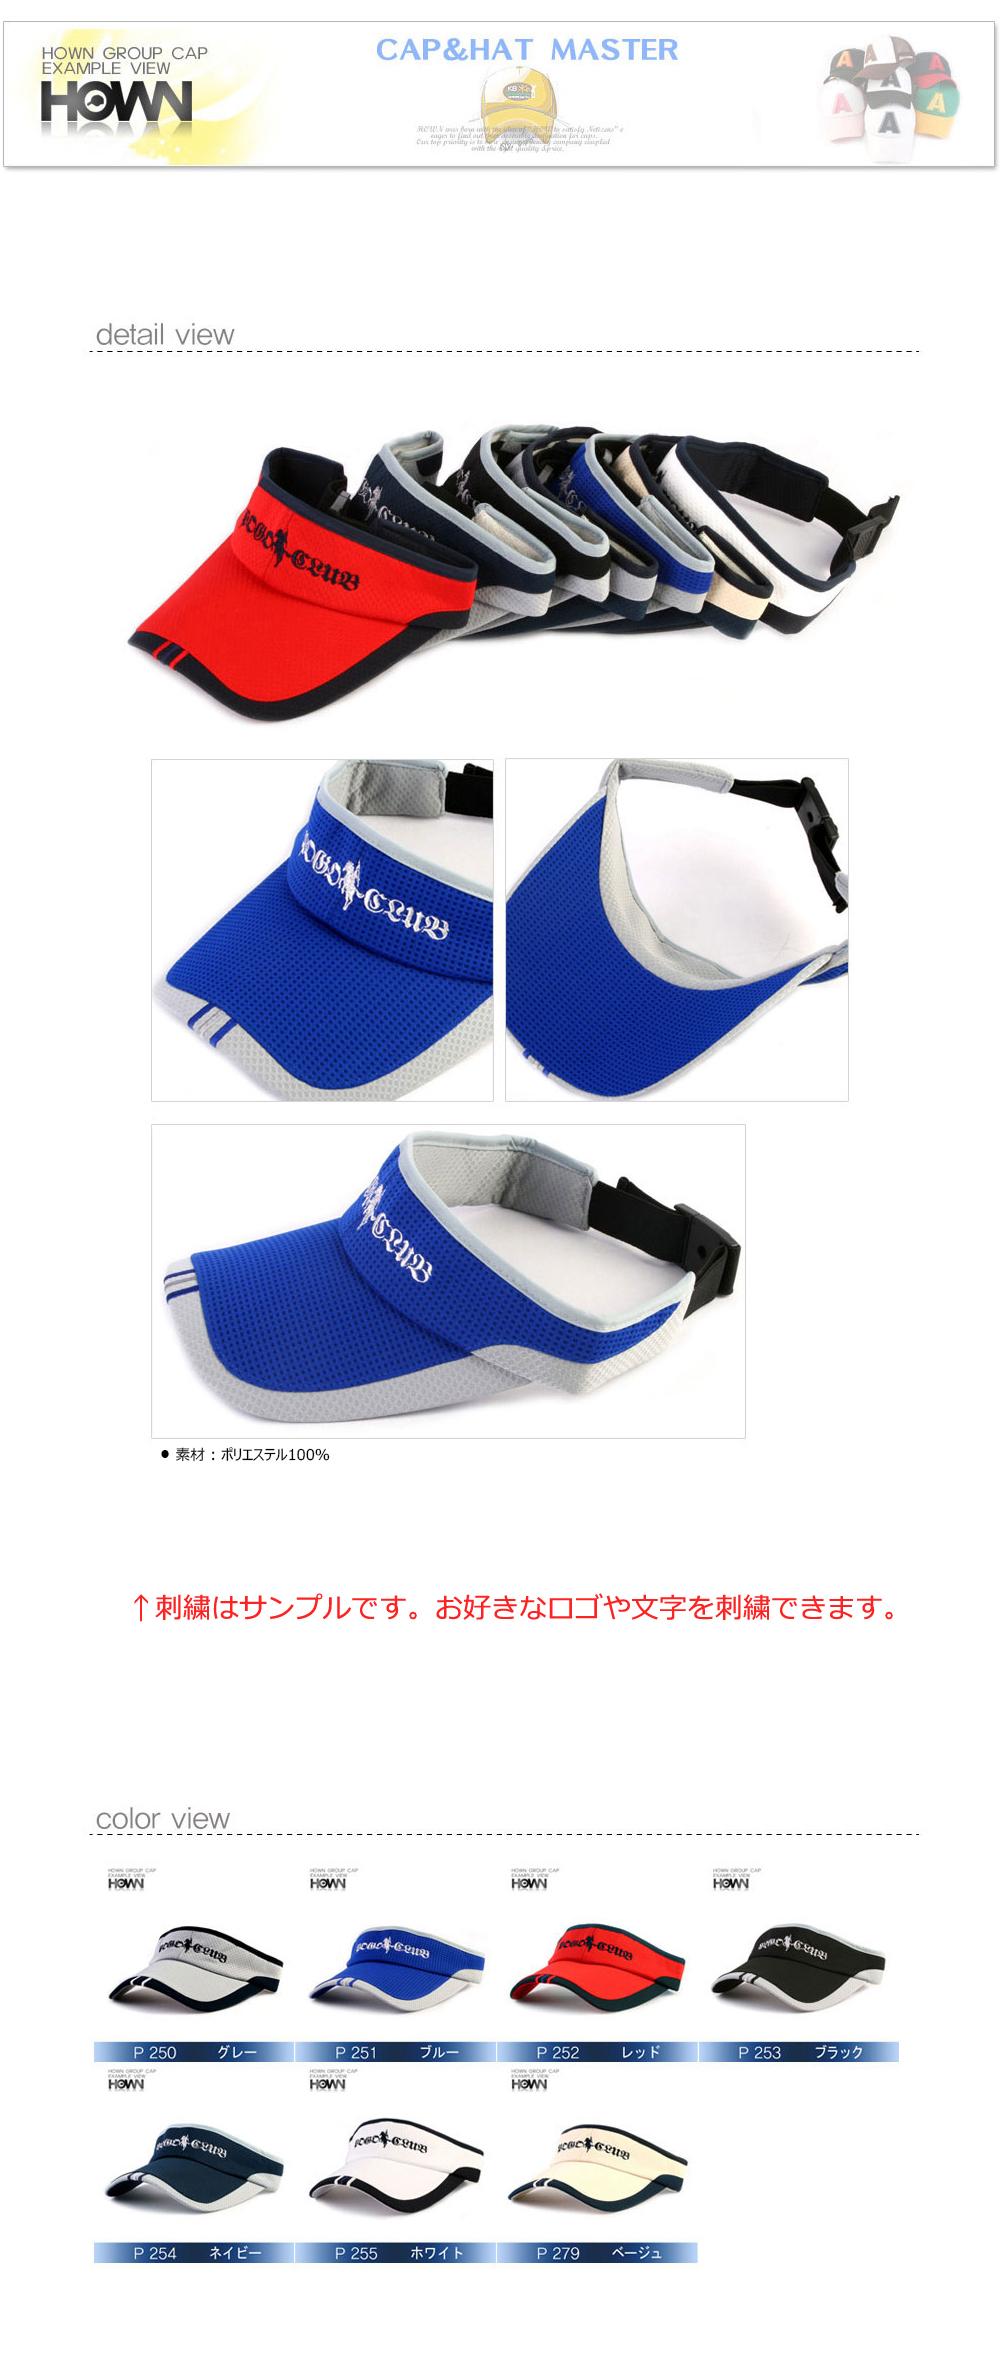 P250 P251 P252 P253 P254 P255 P259 ゴルフサンバイザー1点から製作可能!名前入れ 刺繍 プリント オリジナルキャップ イベント用 野球帽 学校行事 サークル オリジナルサンバイザーに刺繍を!